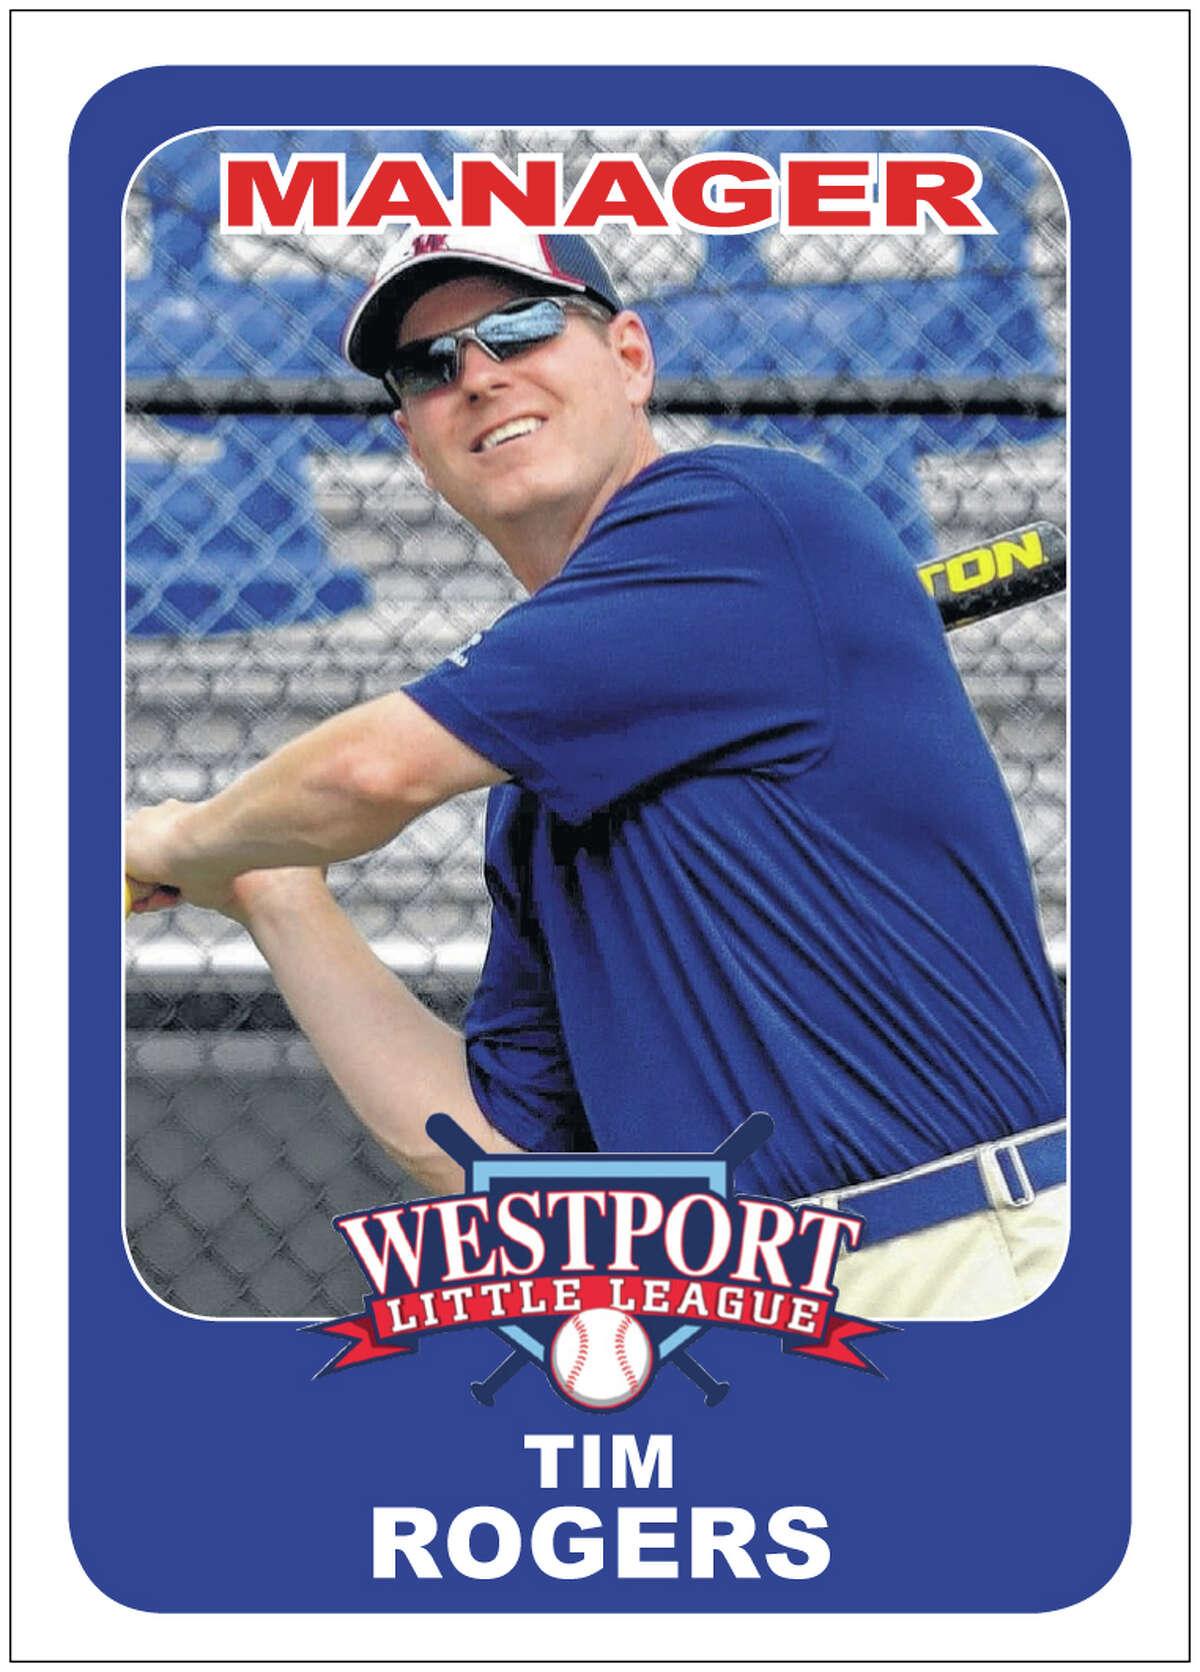 Westport Little League manager Tim Rogers